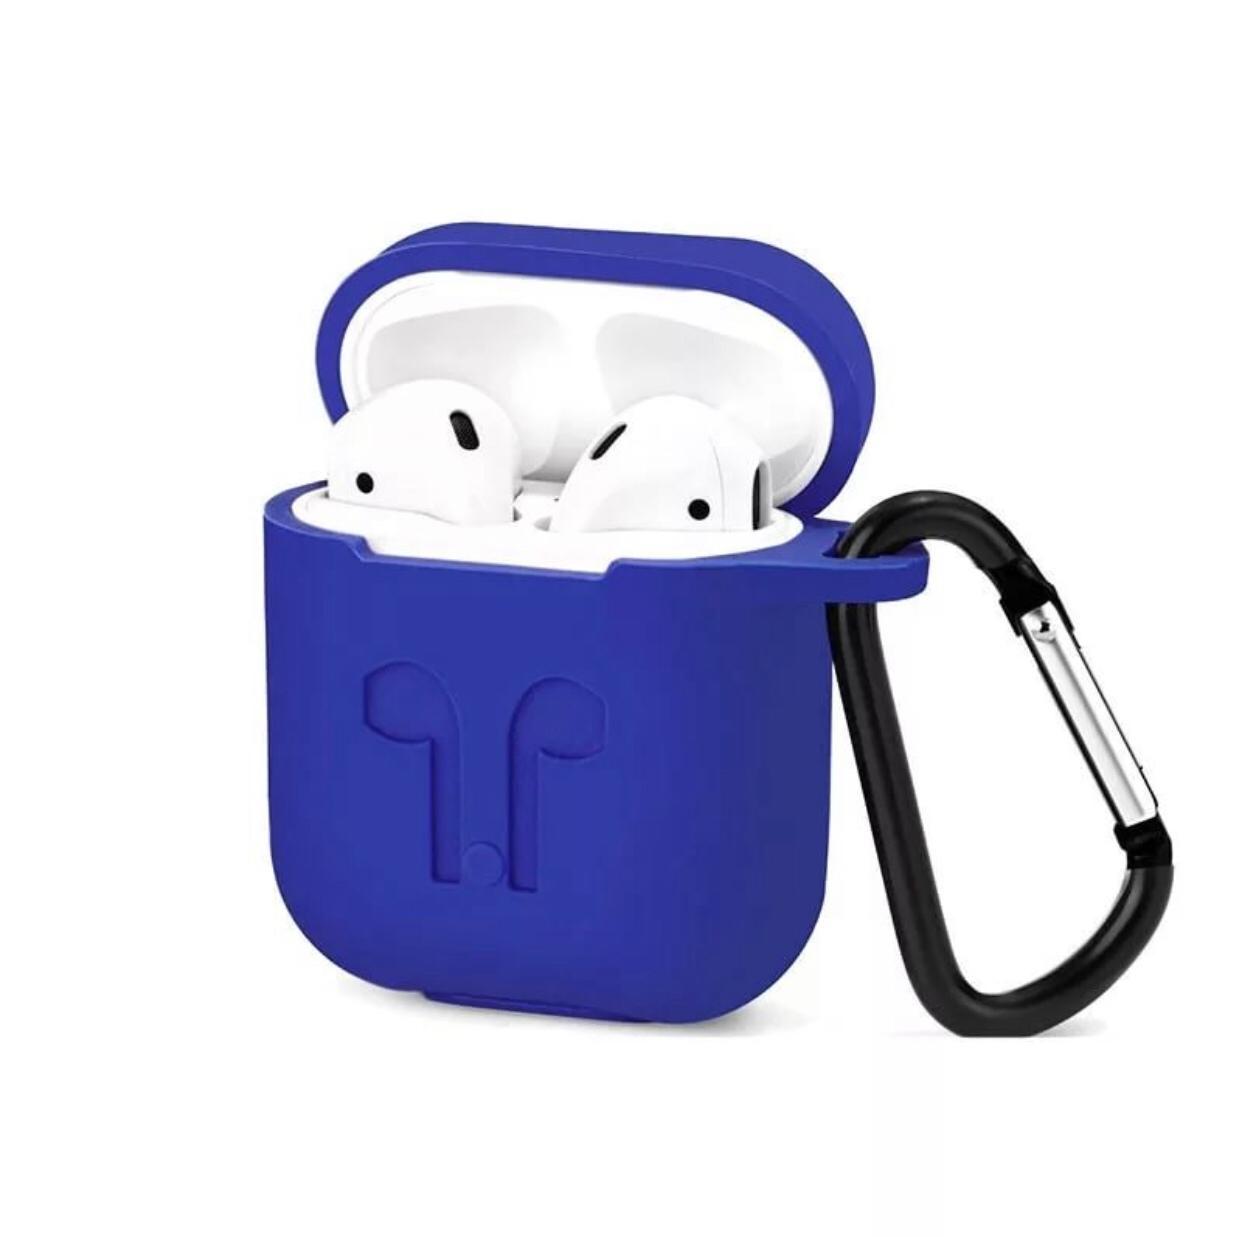 Чехол для наушников Markclub@Hoco Apple AirPods, синий